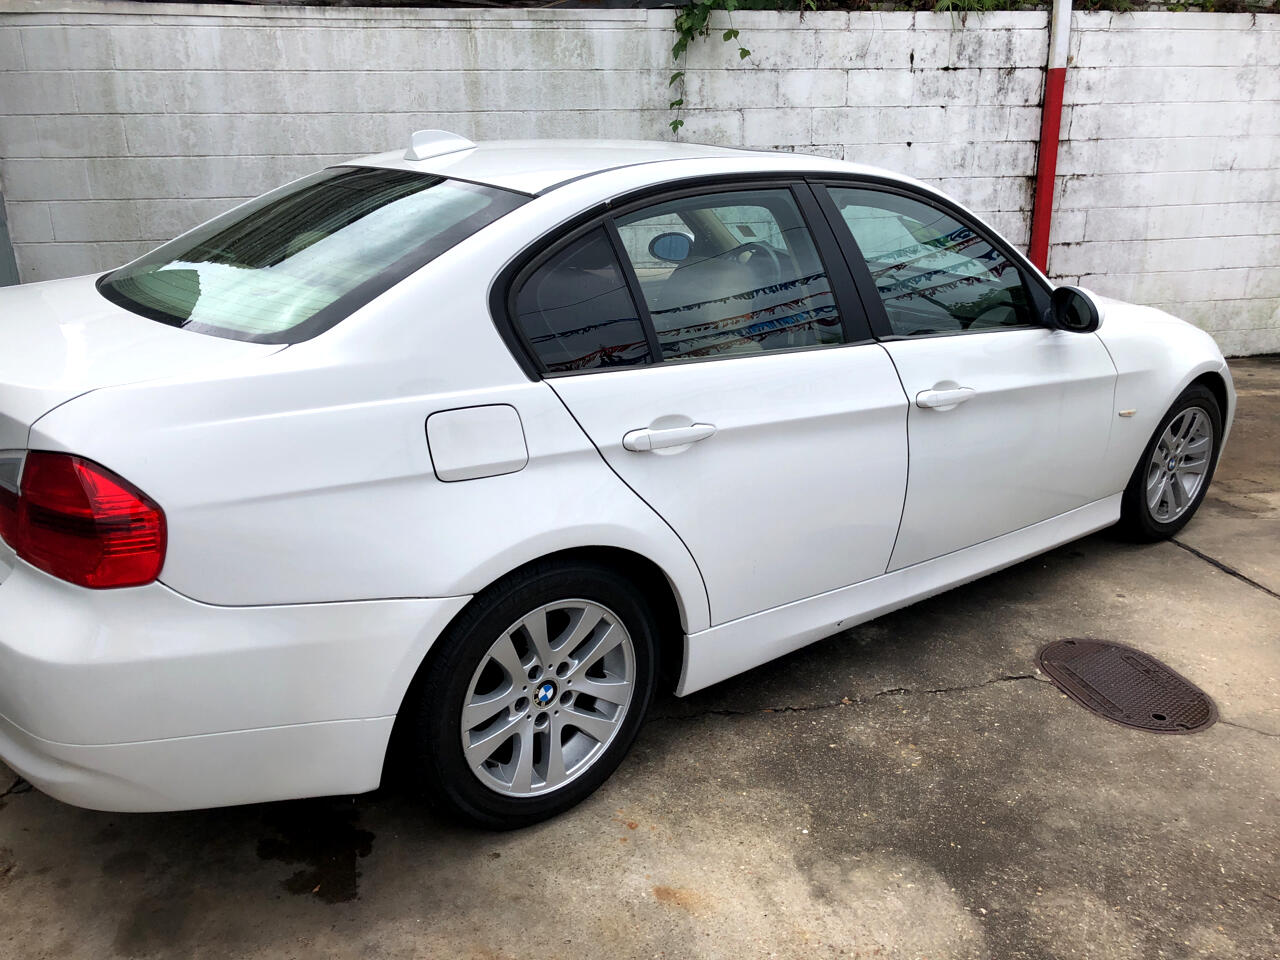 BMW 3 Series 325i 4dr Sdn RWD 2006